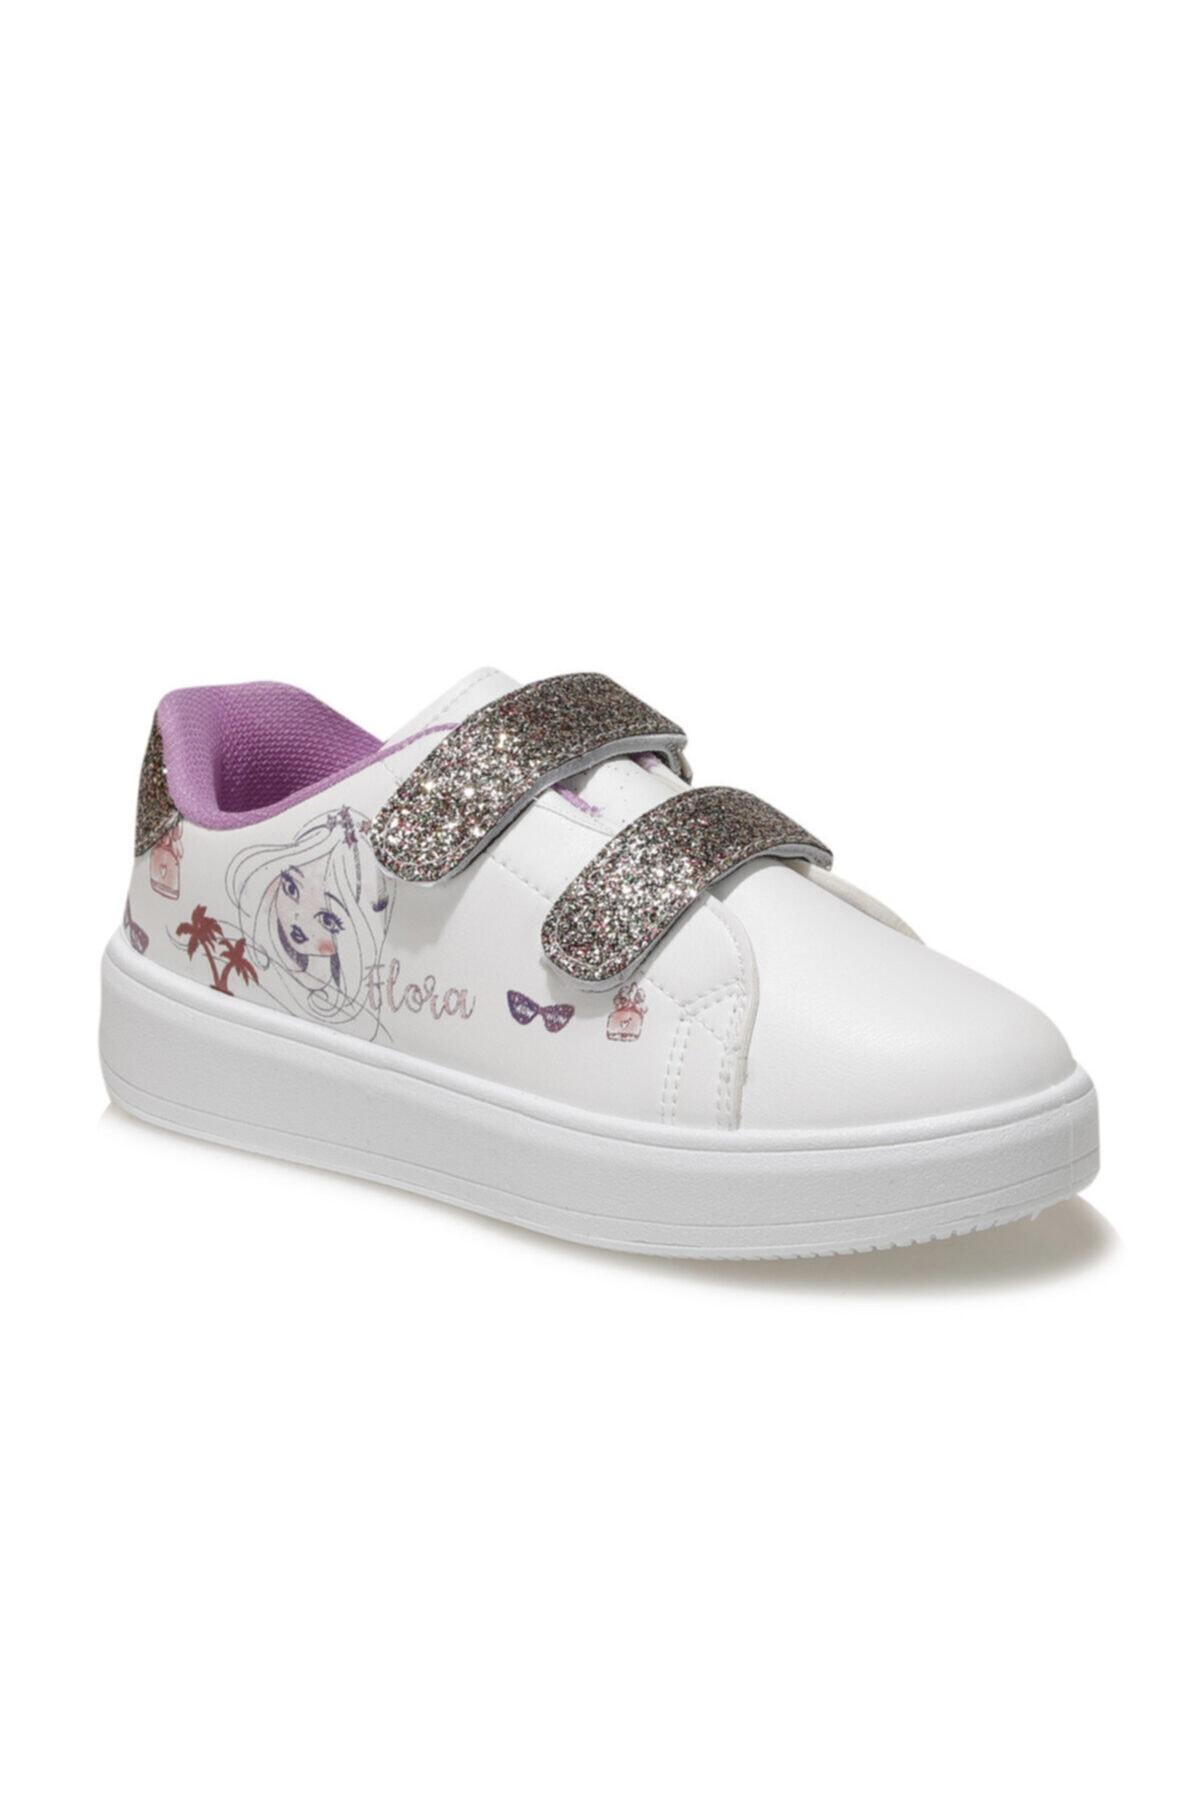 UPIS.F1FX Beyaz Kız Çocuk Sneaker 100938644